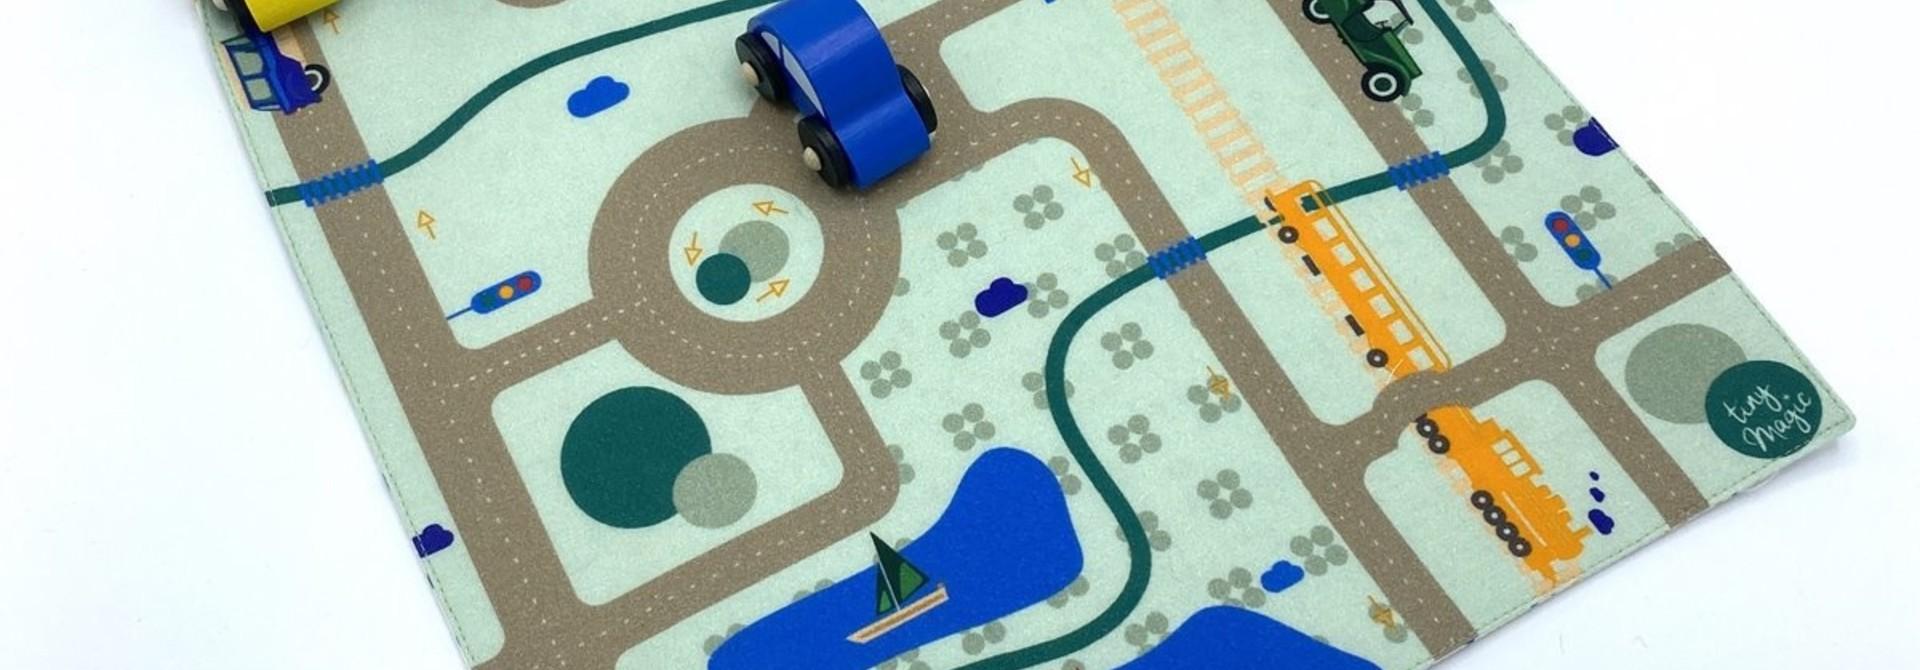 Speelmat autobaan Tiny Magic